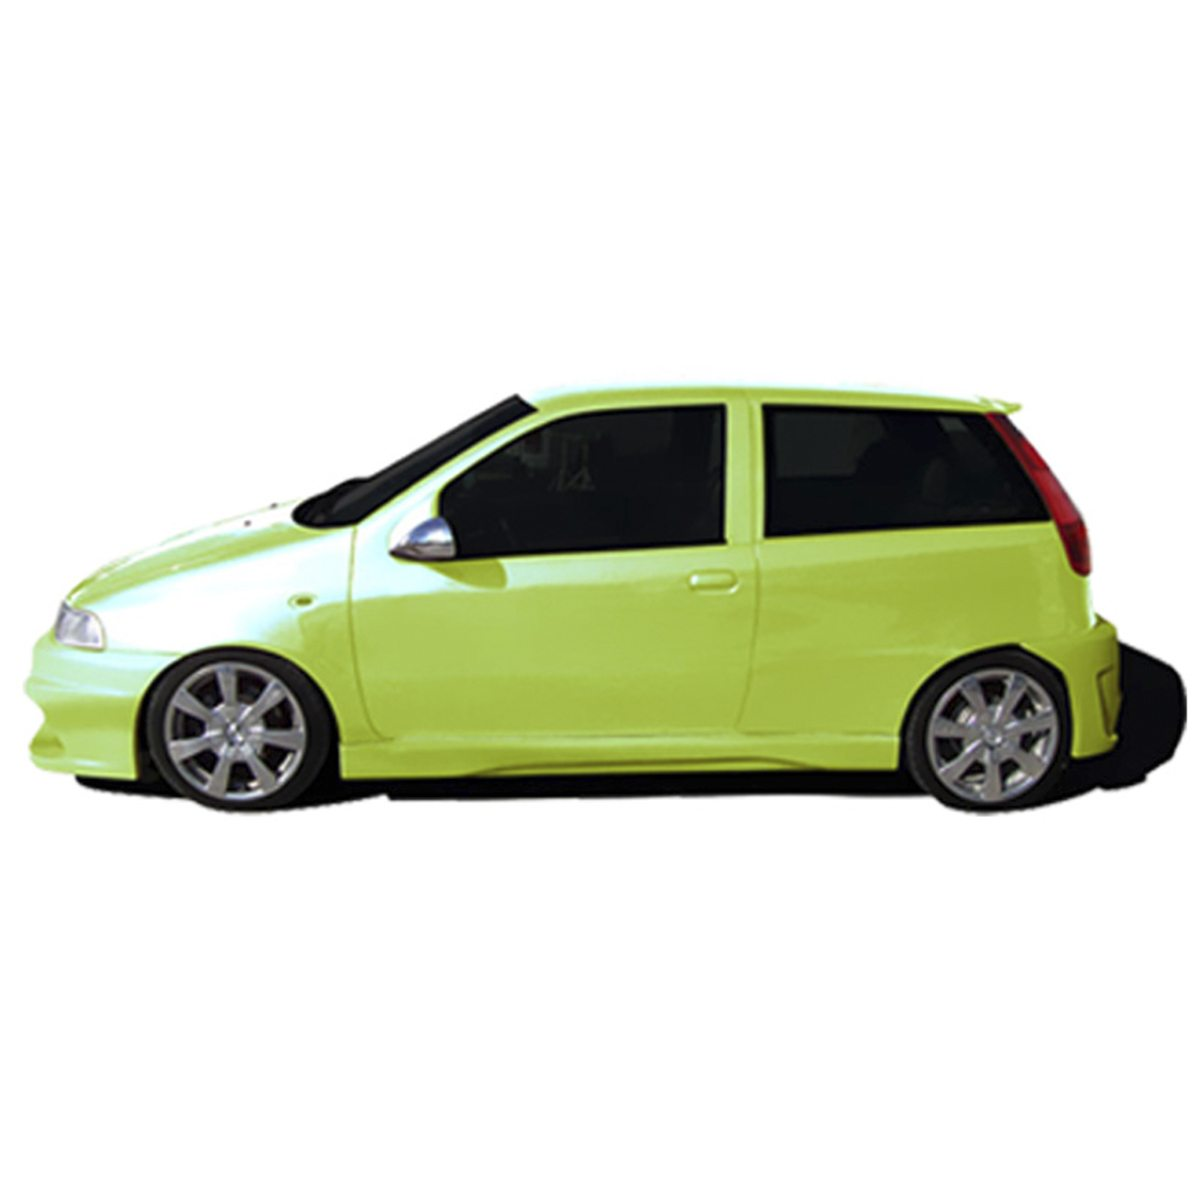 Fiat-Punto-Sphinx-emb-EBS029